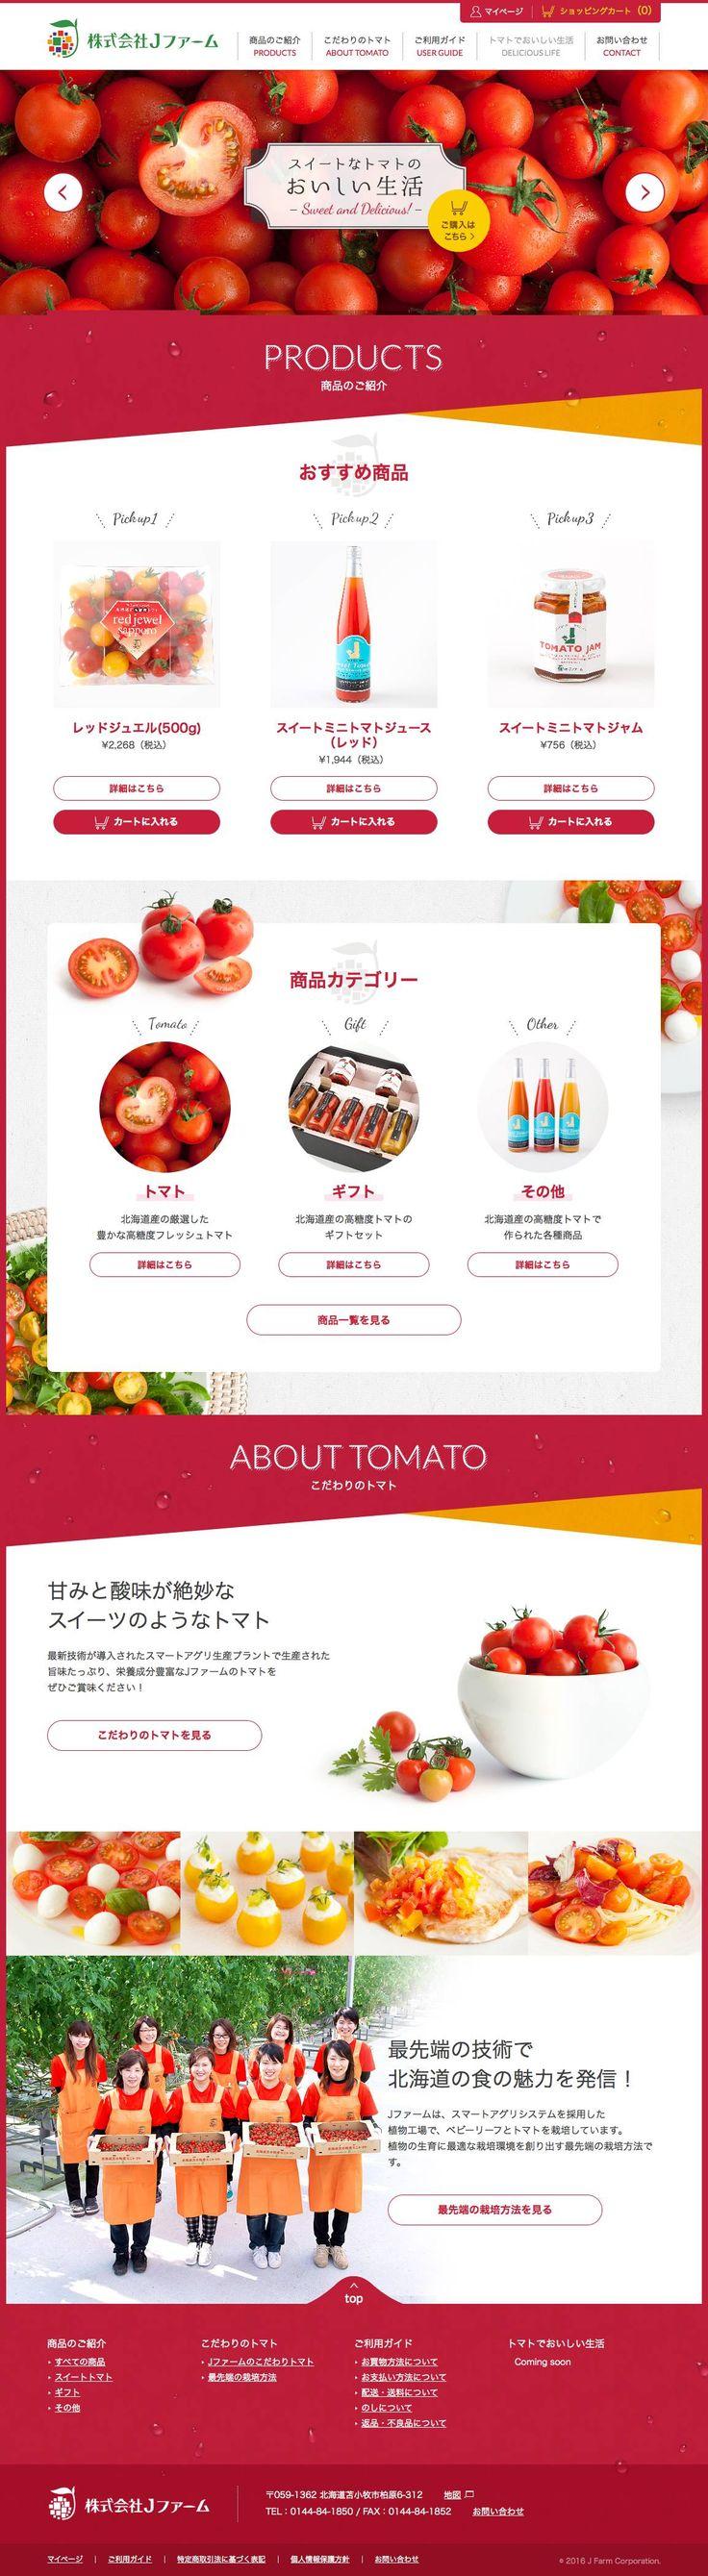 http://jfarm-tomato.com/